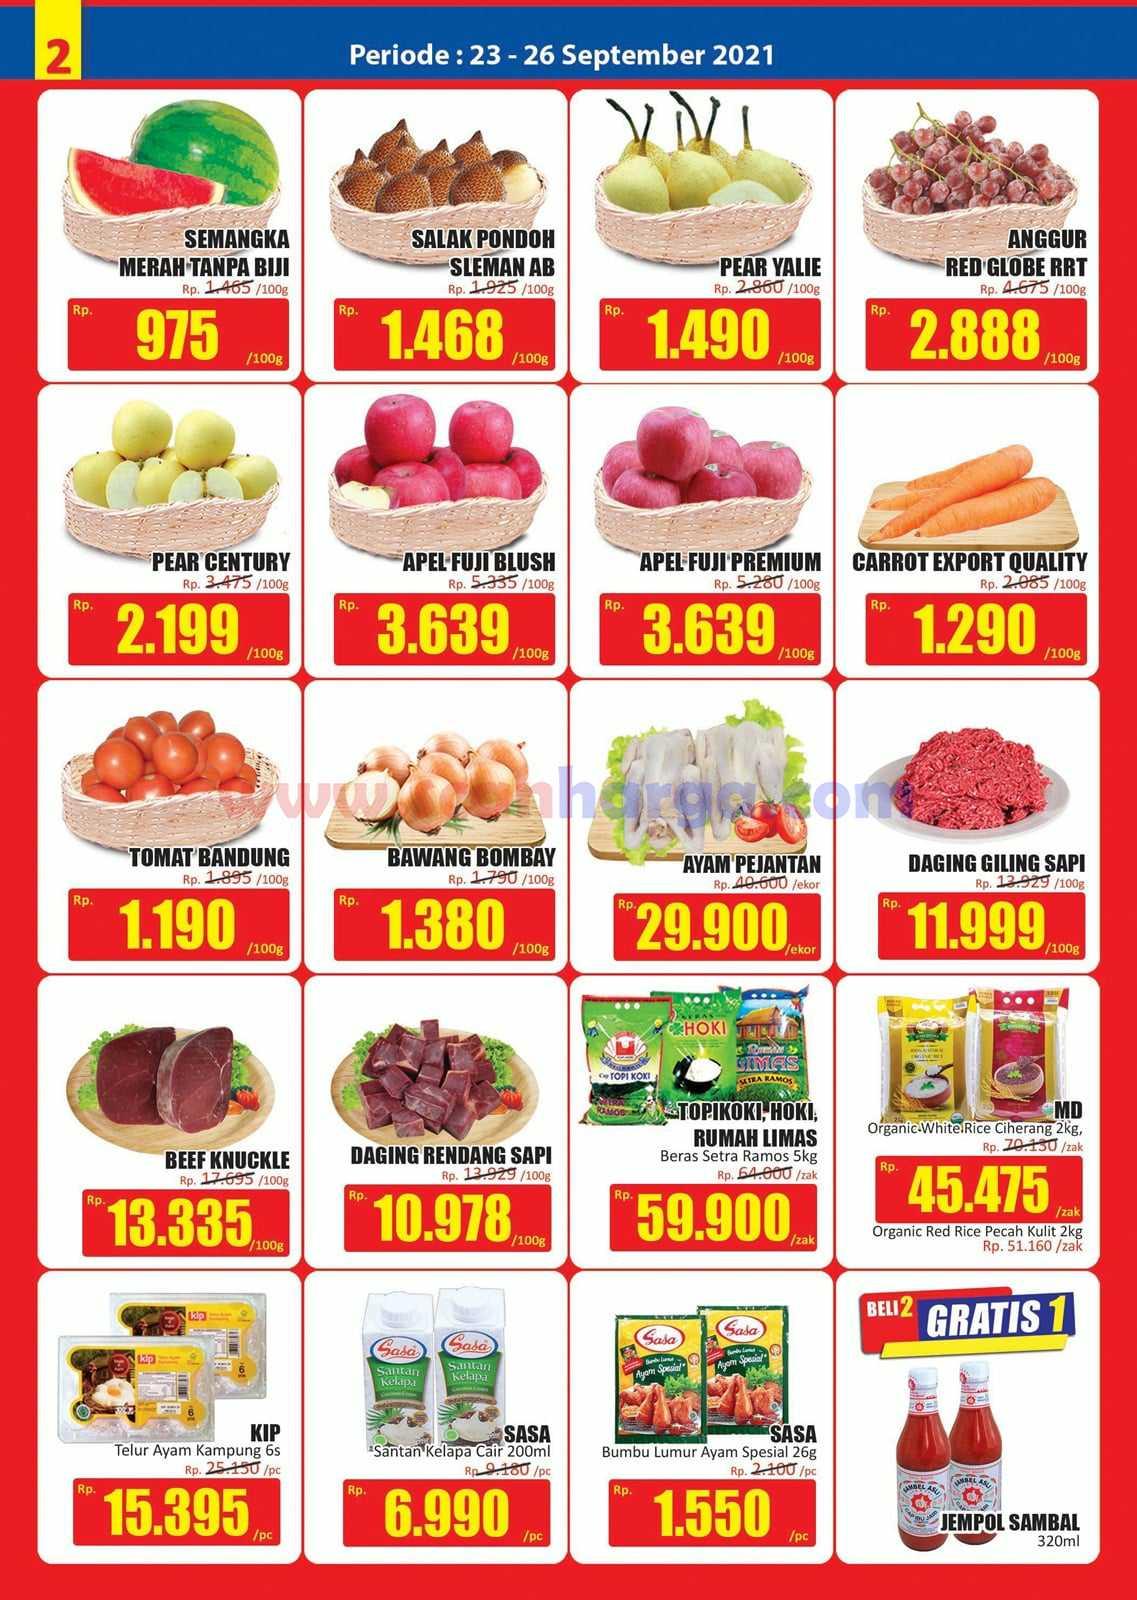 Katalog Promo JSM Hari Hari Swalayan Weekend 23 - 26 September 2021 2